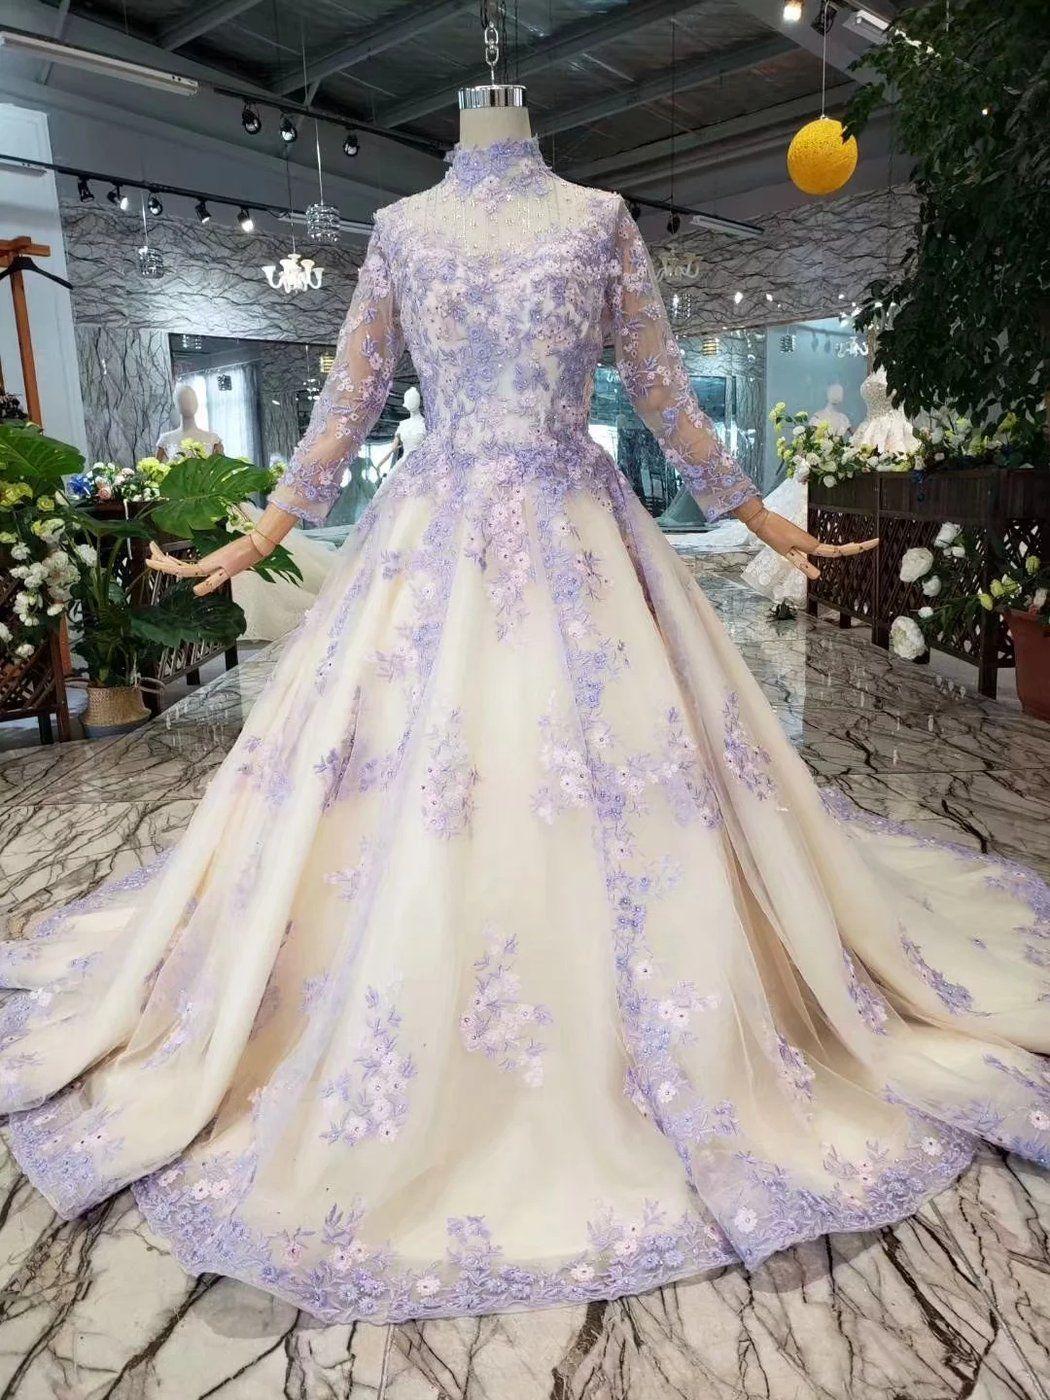 Light Purple Bridal One Shoulder Slim Luxury Trailing Wedding Dress Ostty Vestidos De Princesa Detalles De Moda Ropa [ 1400 x 1050 Pixel ]